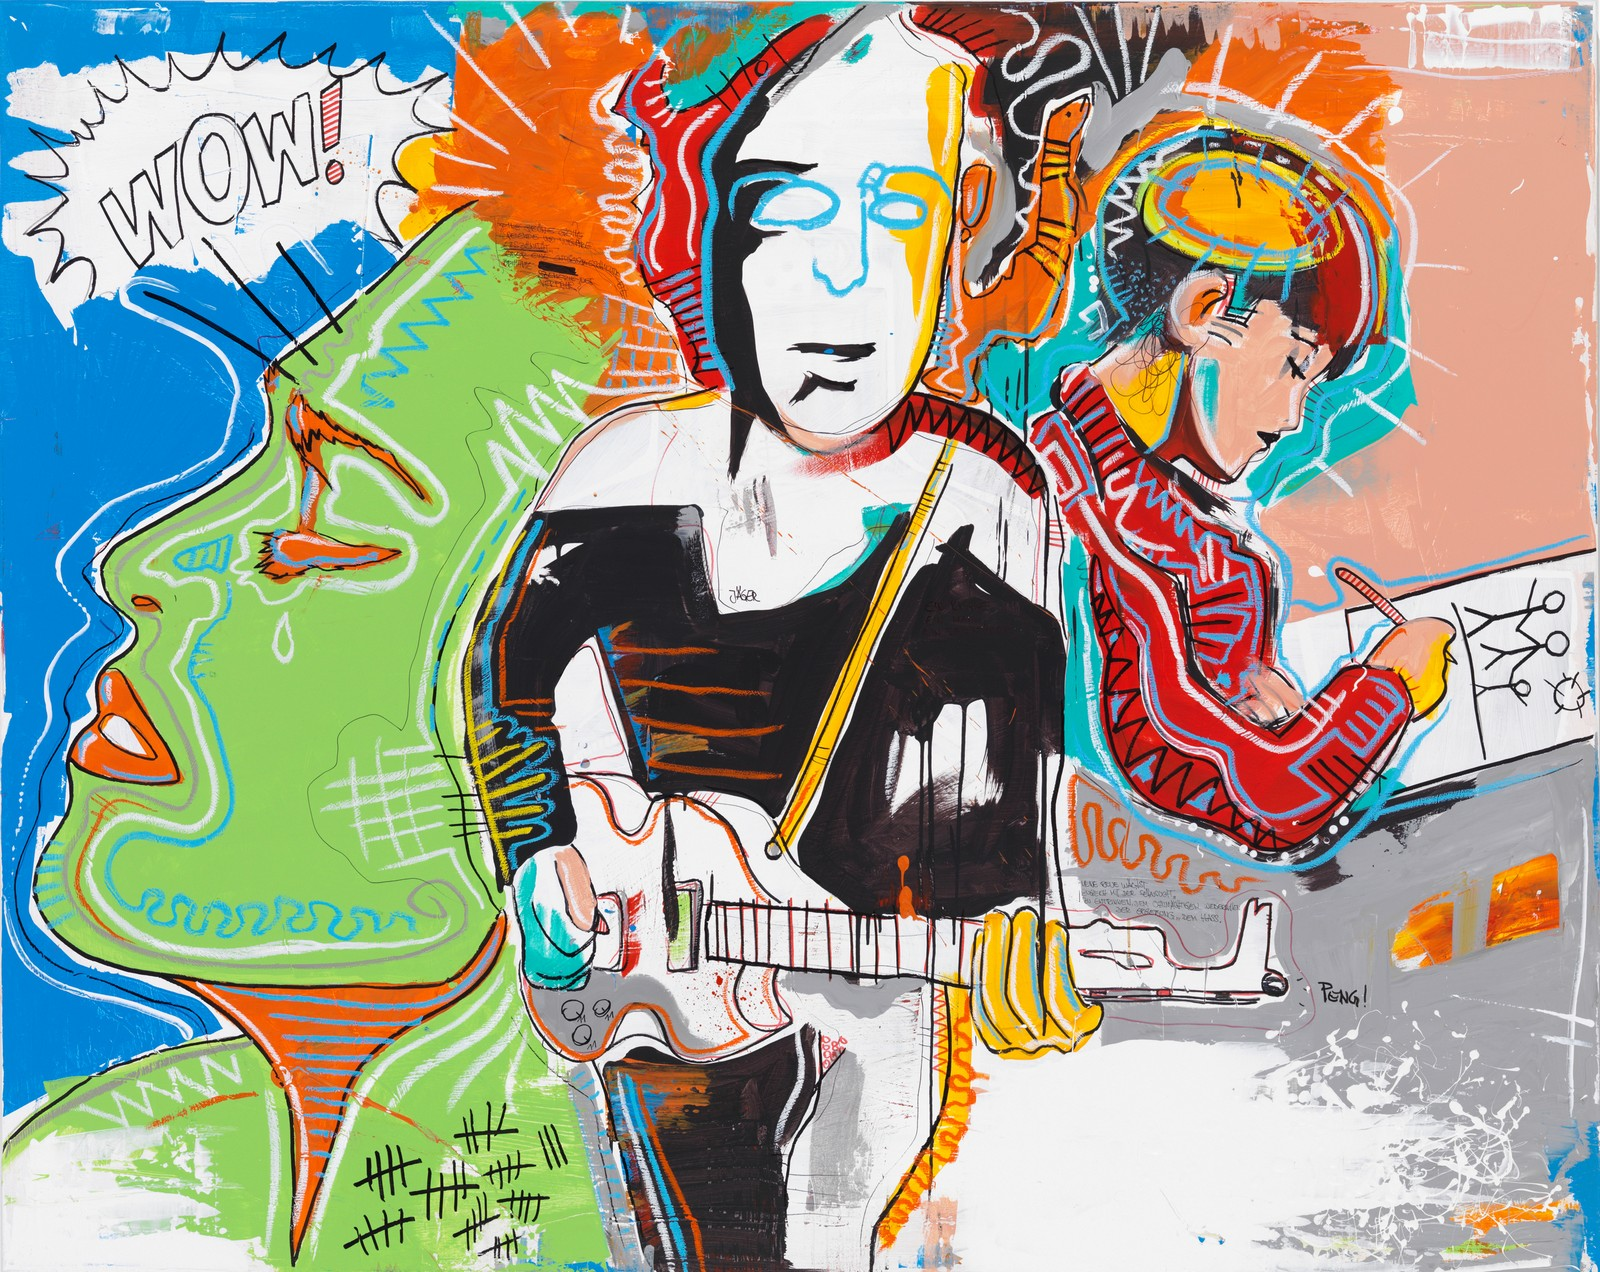 2013, acrylic and chalk on canvas, 160 x 200 cm